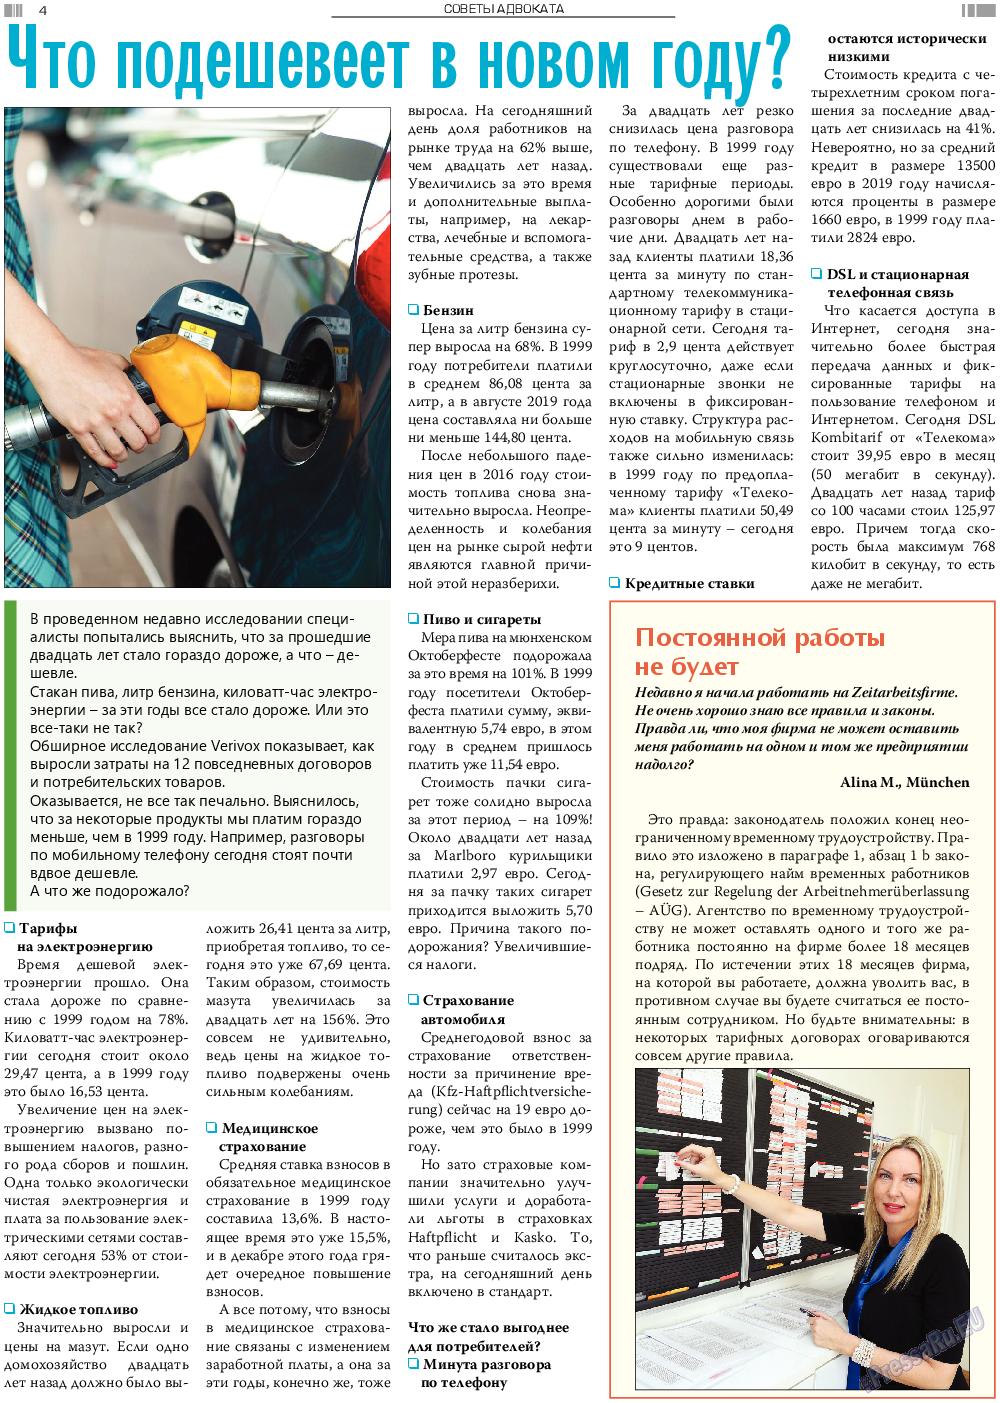 Анонс (газета). 2020 год, номер 1, стр. 4